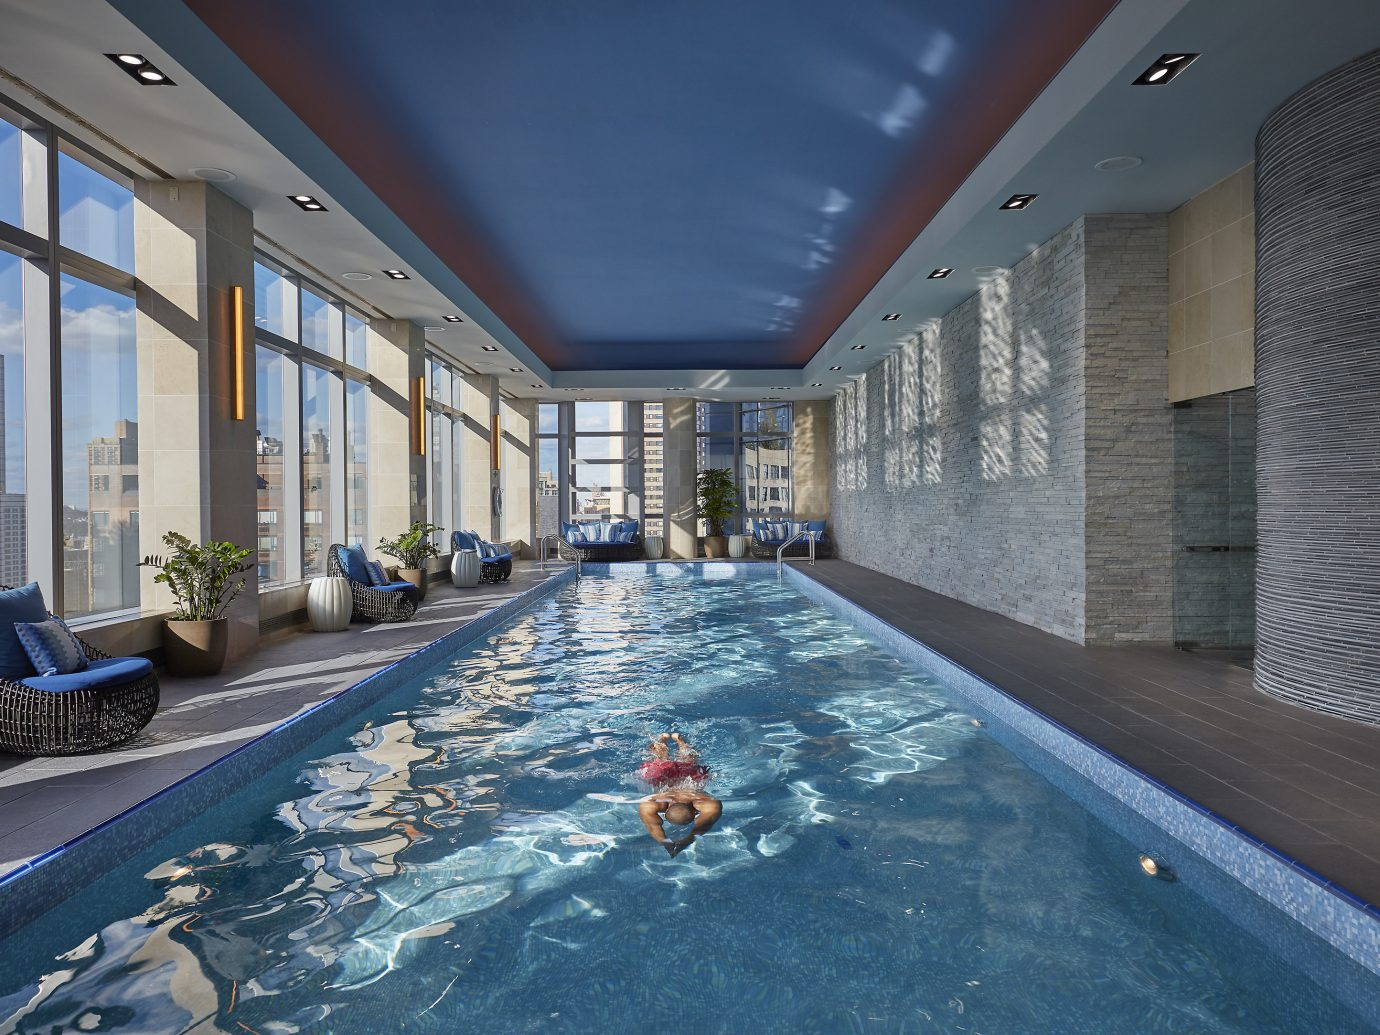 Wellness pool overlooking NYC at Mandarin Oriental